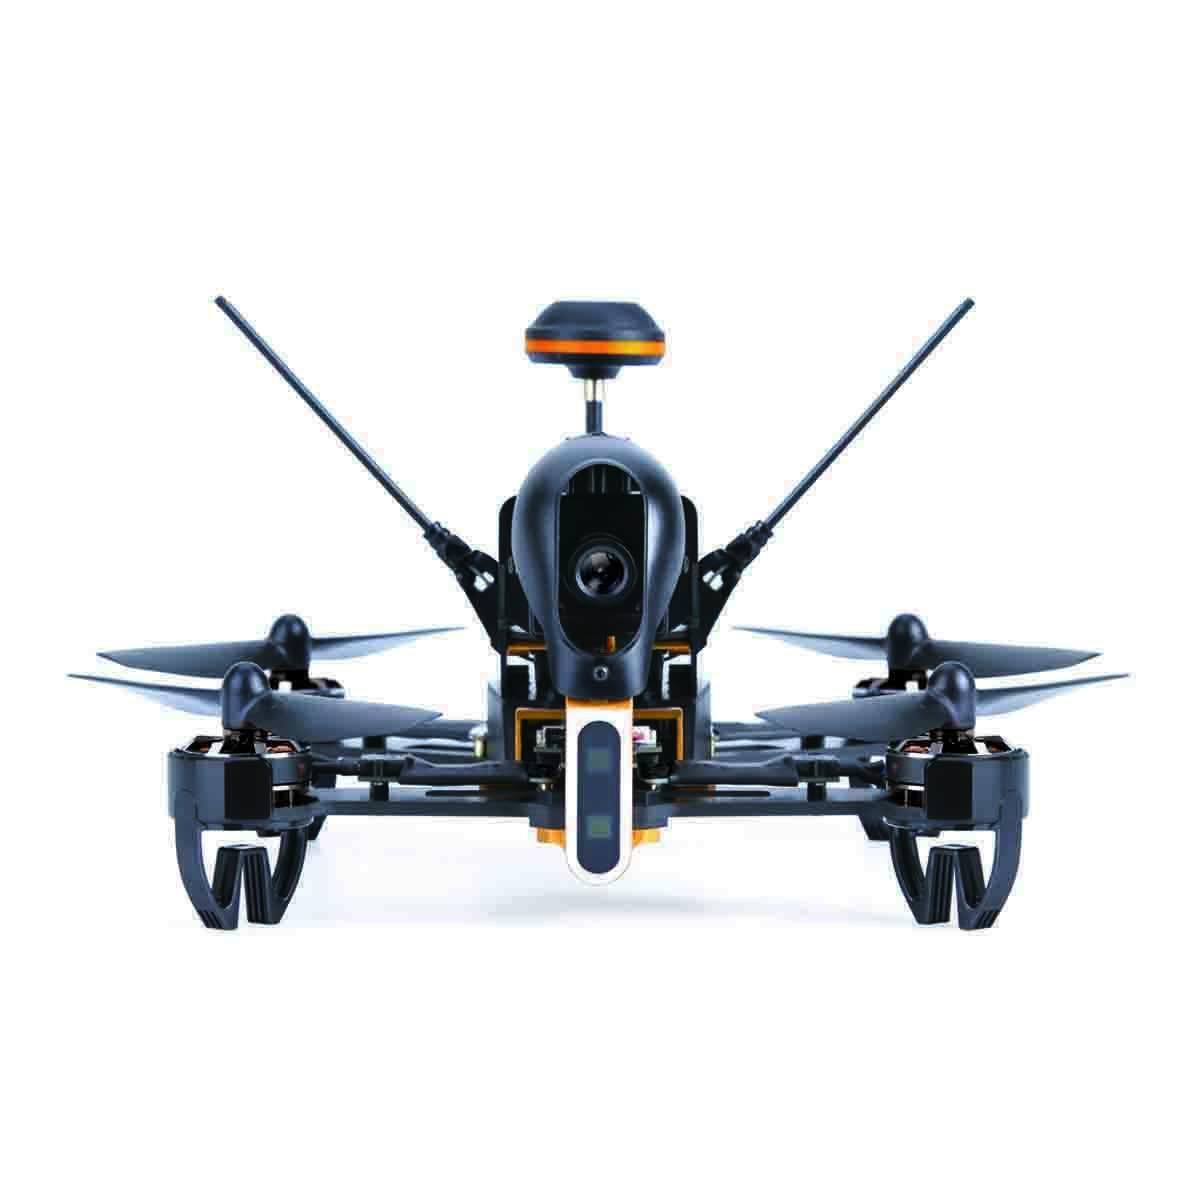 Skilled Racer 5.8G FPV BNF RC Quadcopter – Black